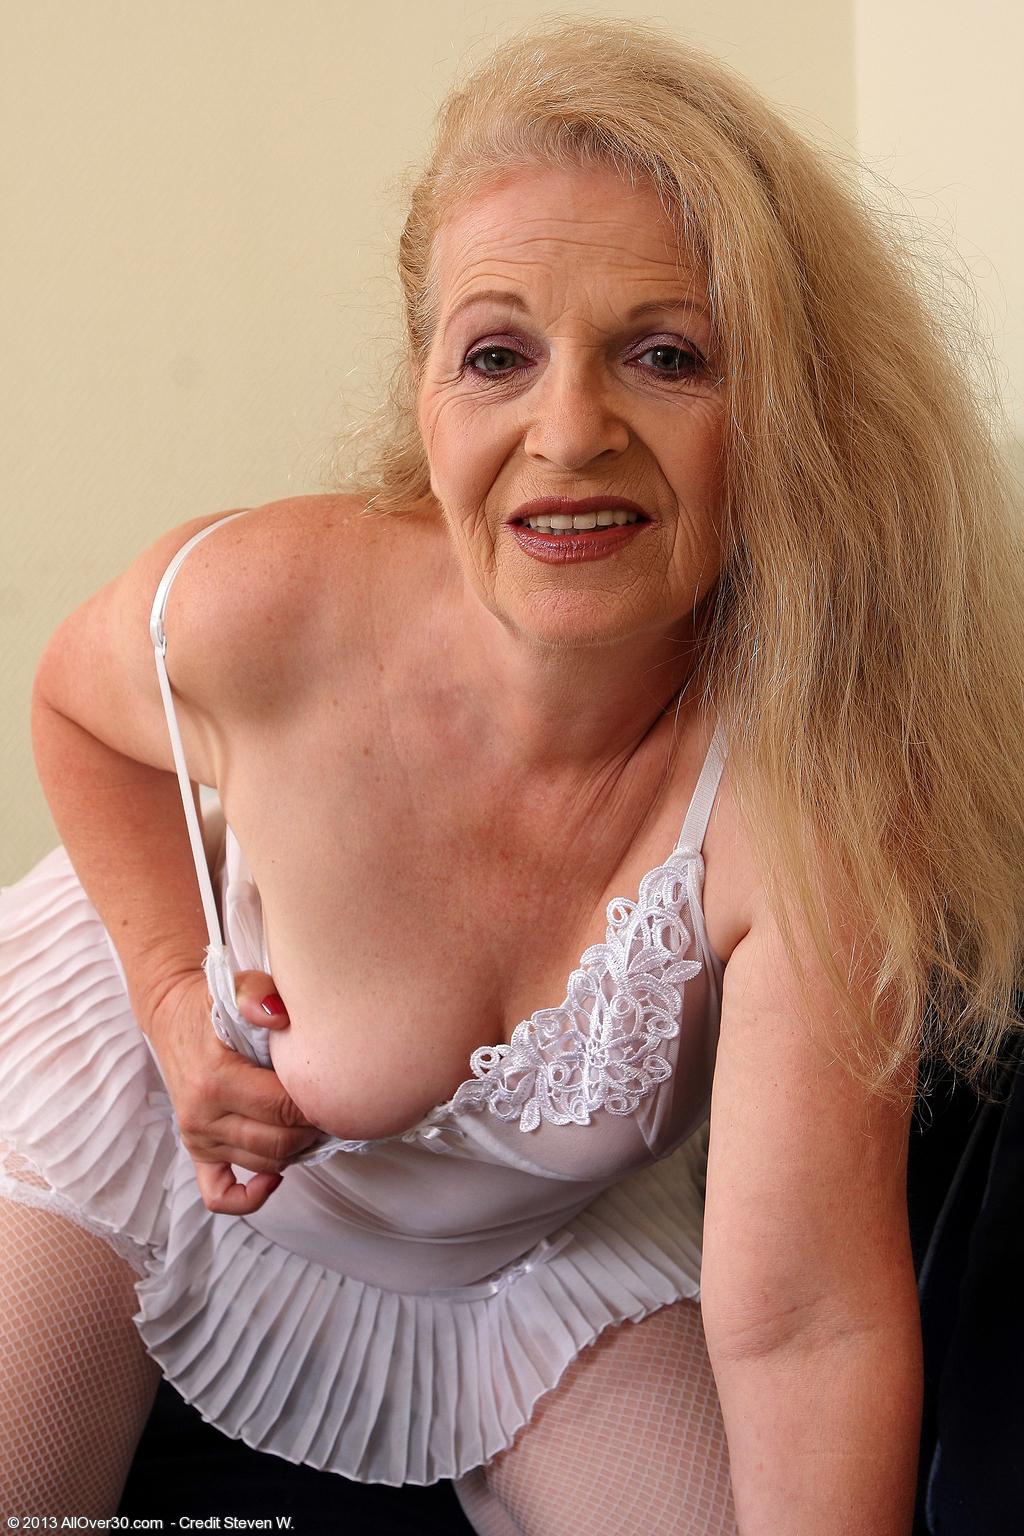 Yo nude 50 mature